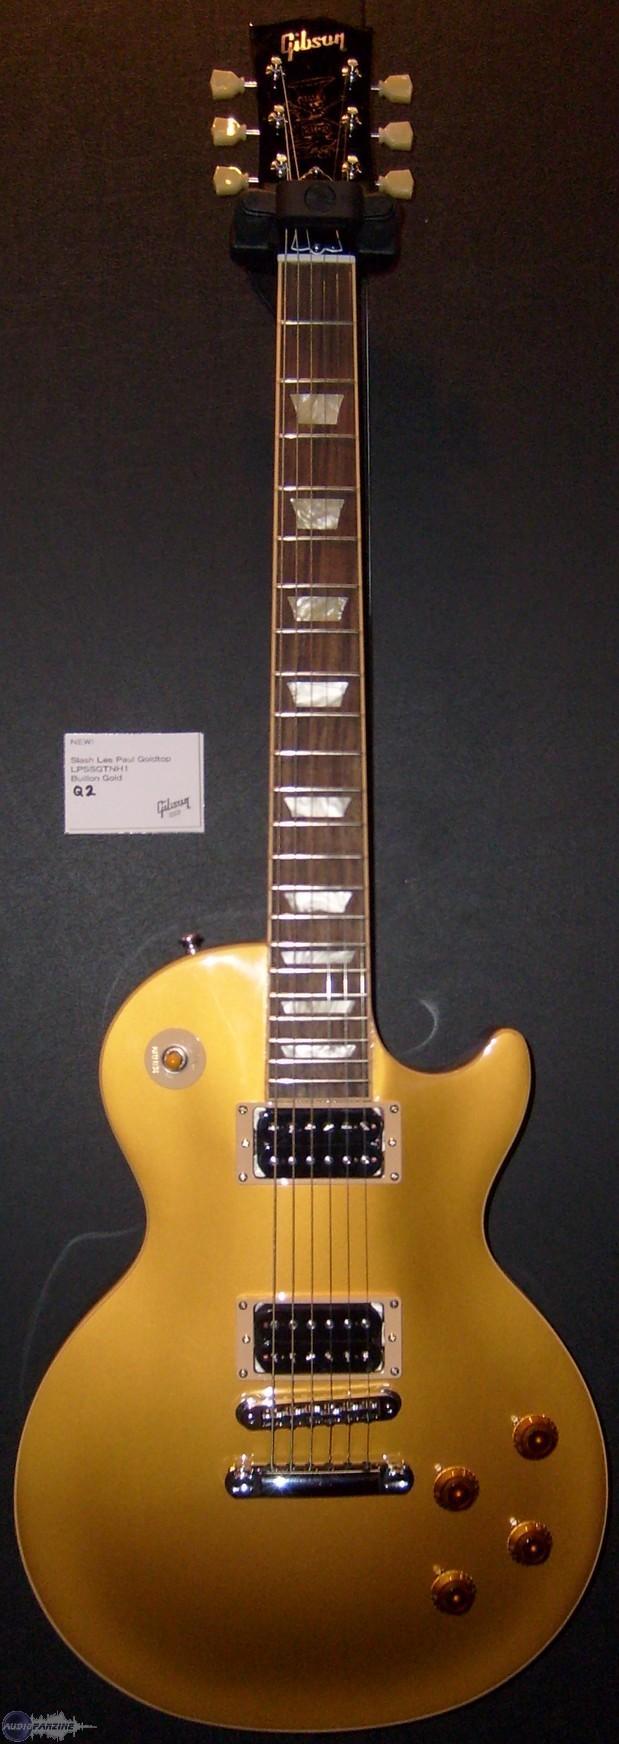 Slash Goldtop Les Paul : gibson slash les paul goldtop image 513930 audiofanzine ~ Hamham.info Haus und Dekorationen